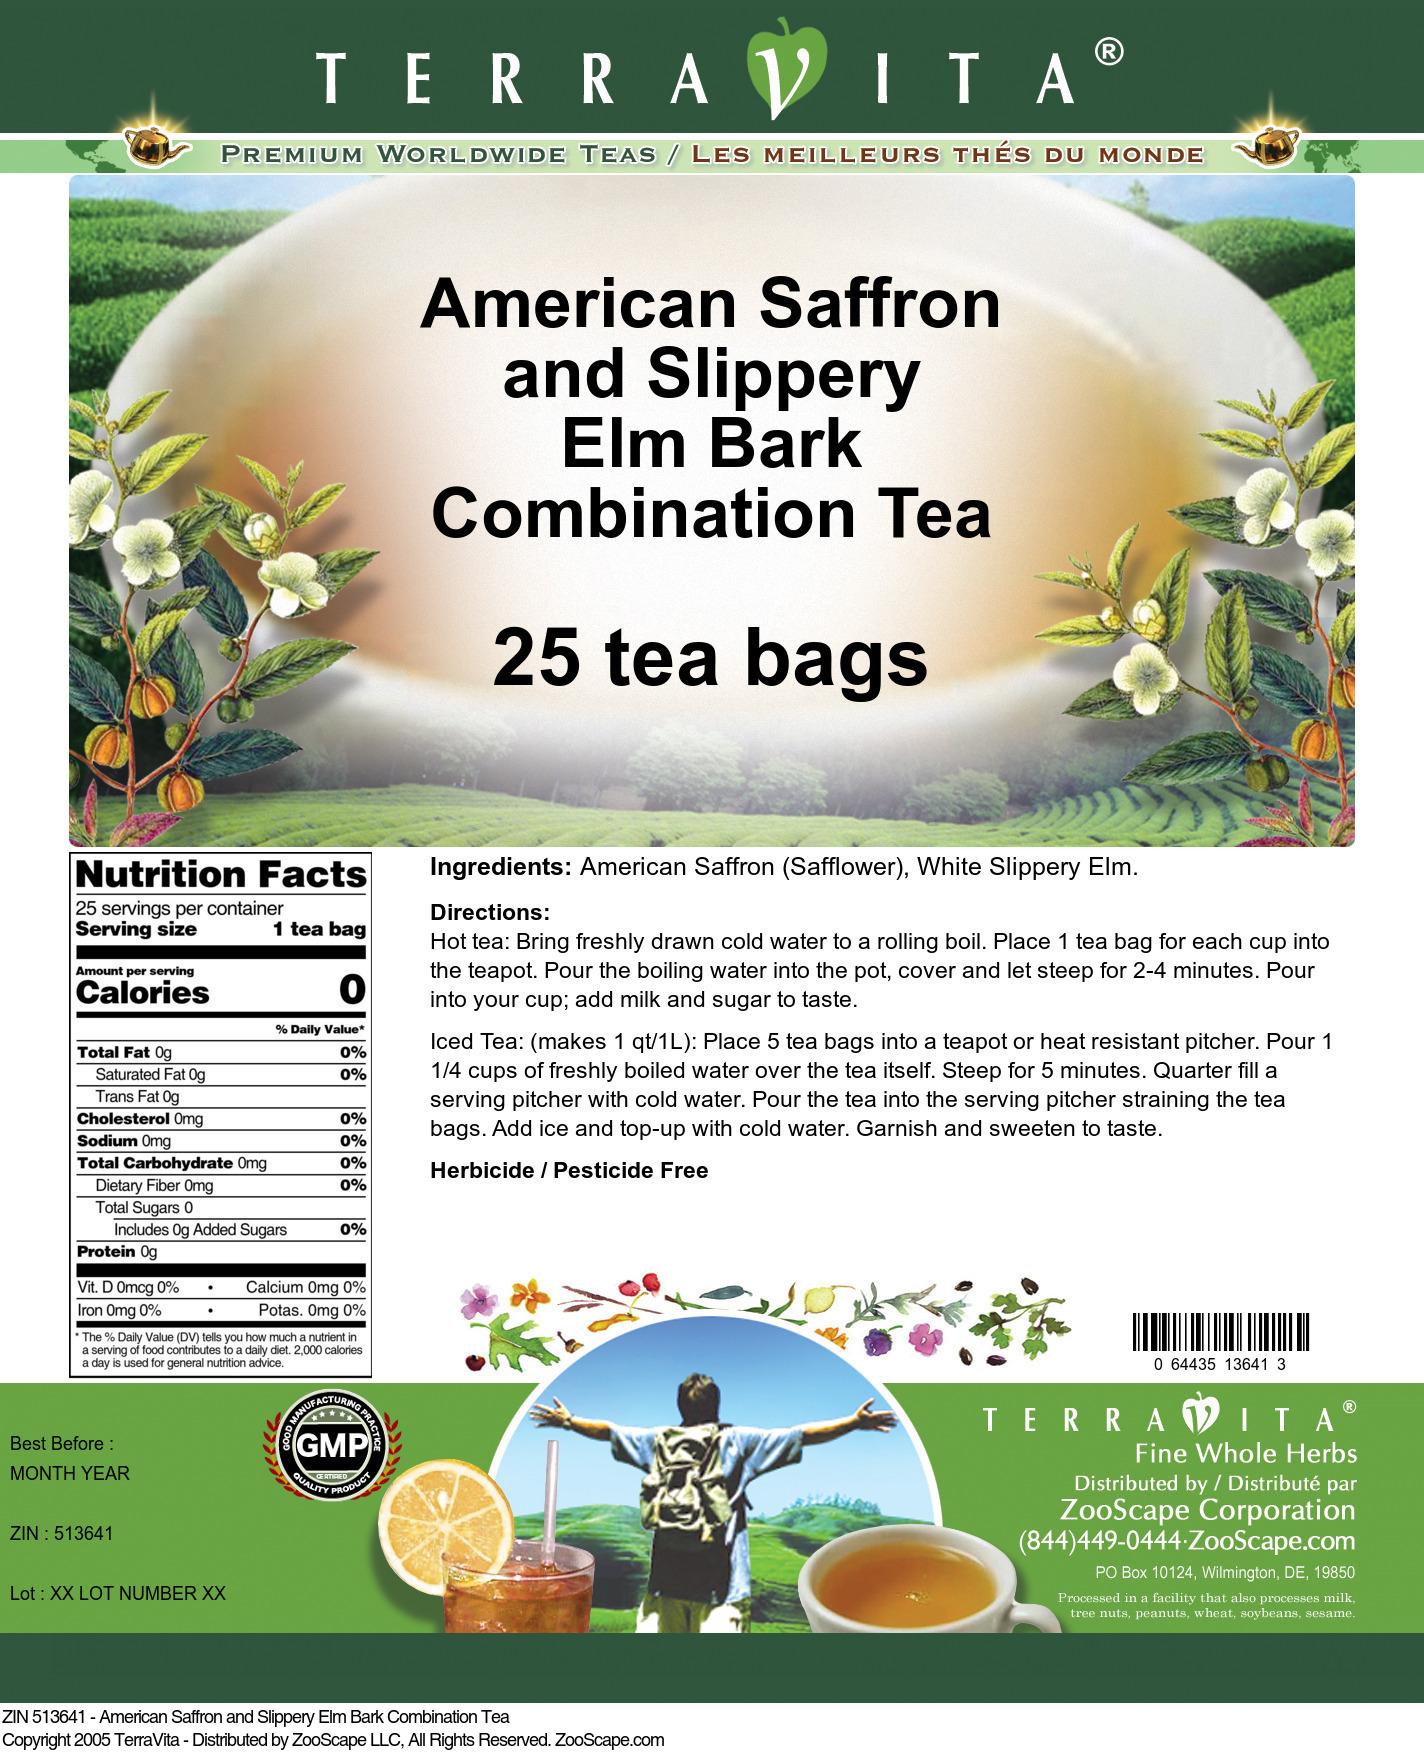 American Saffron and Slippery Elm Bark Combination Tea